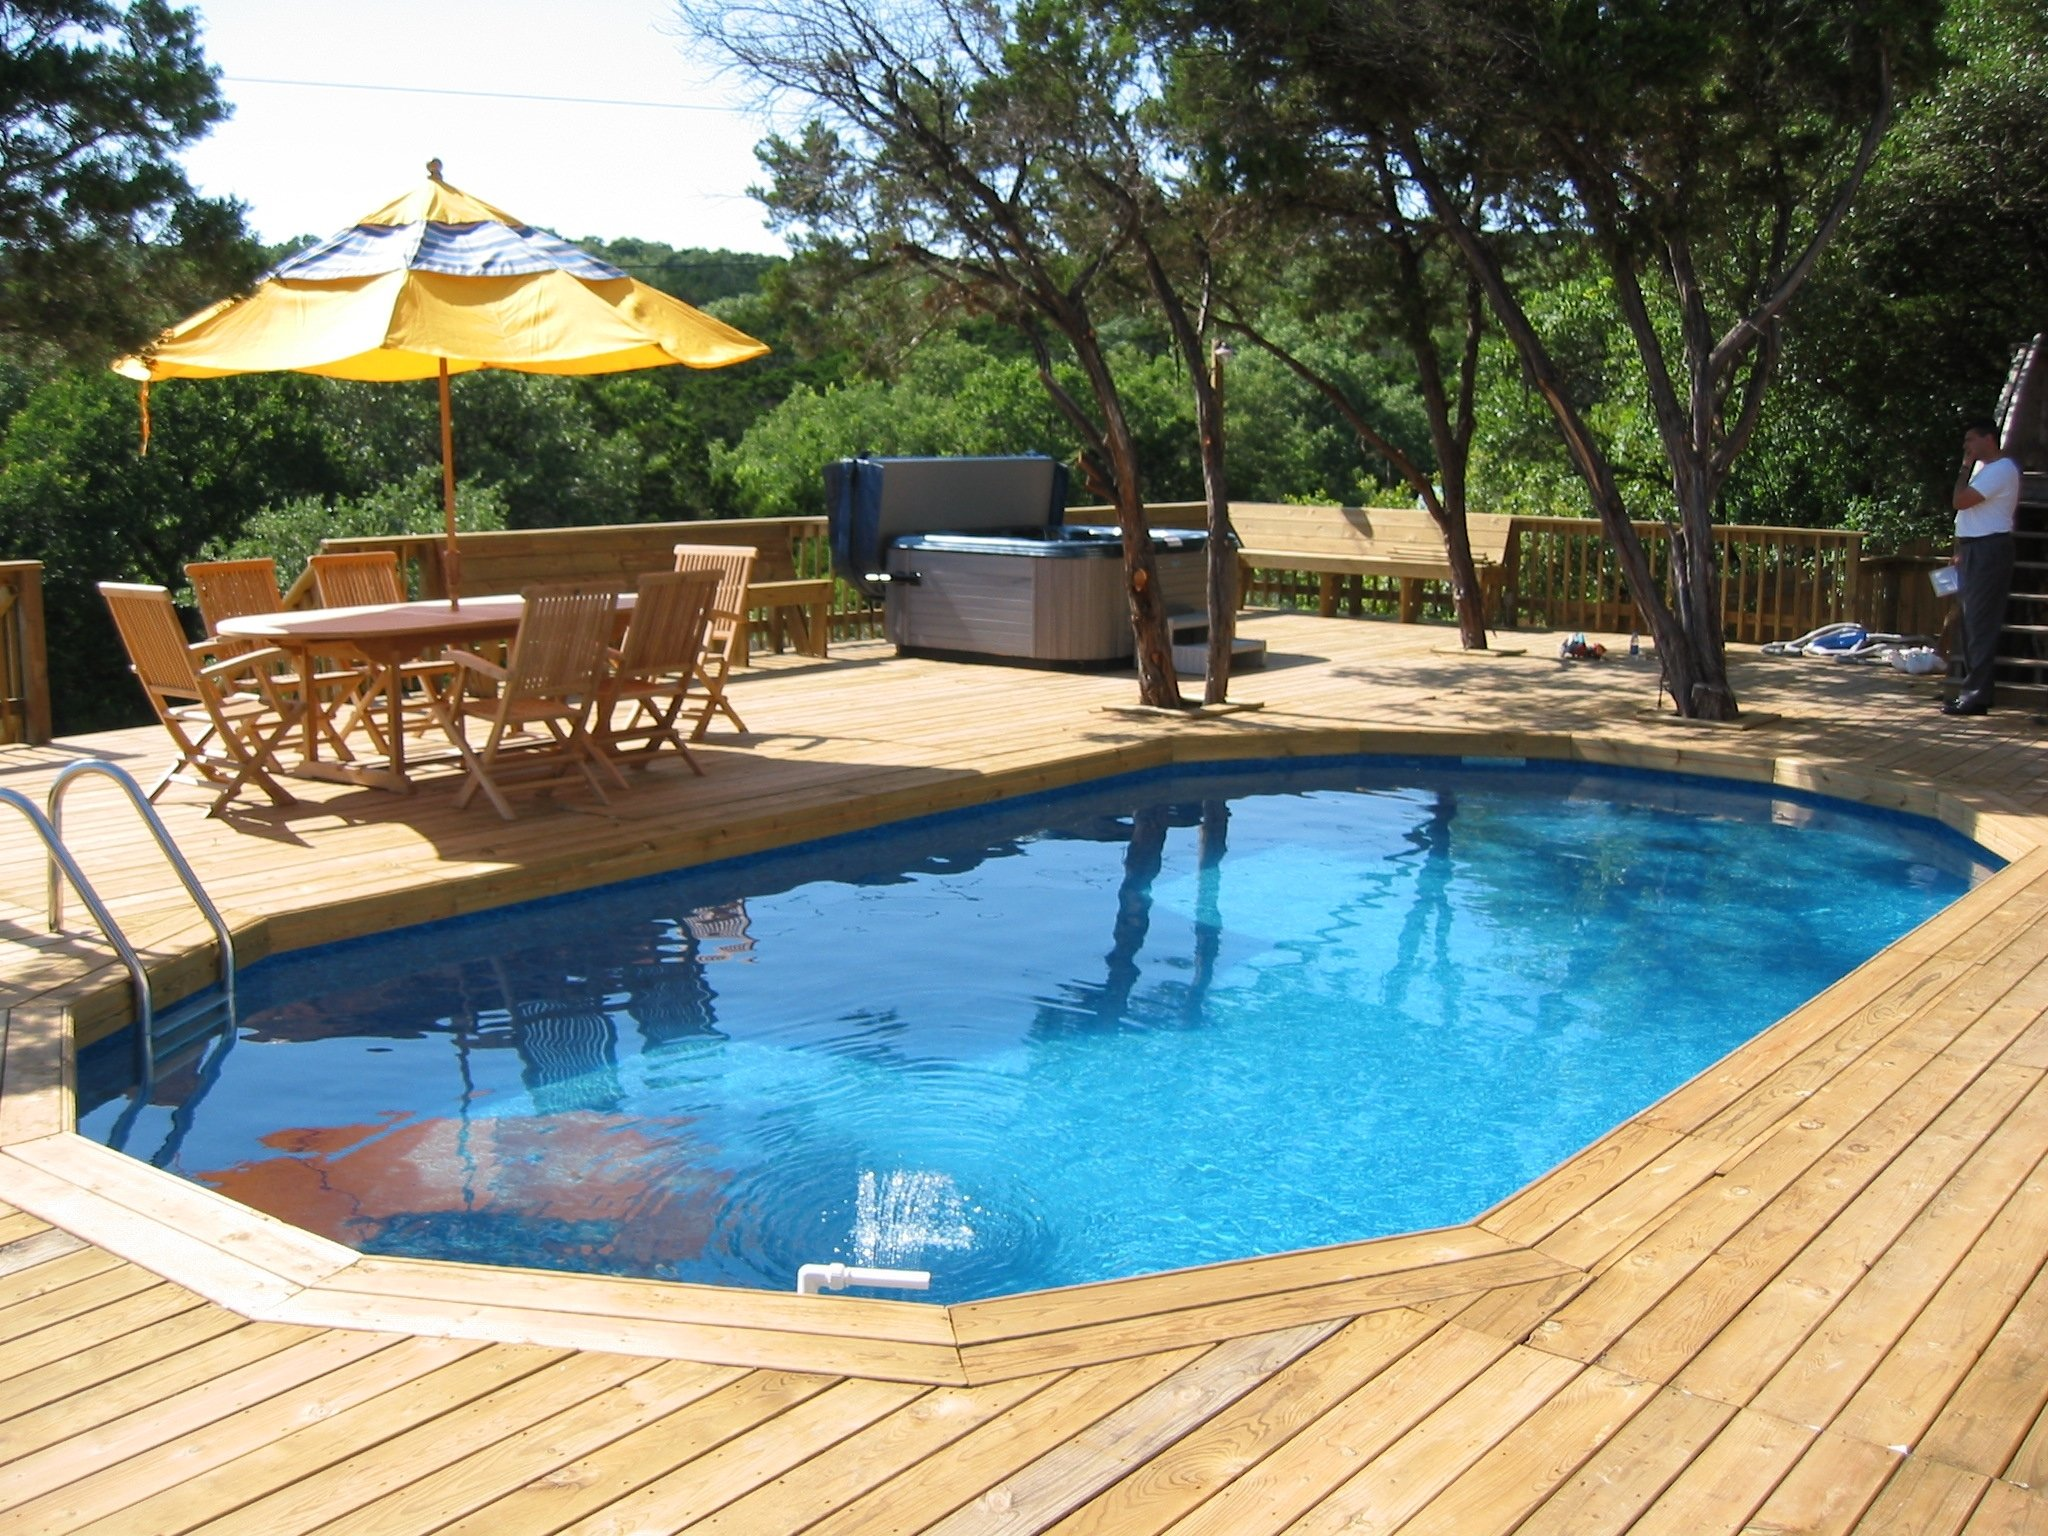 10 Stylish Pool Deck Ideas Above Ground best swimming pool deck ideas above ground loversiq